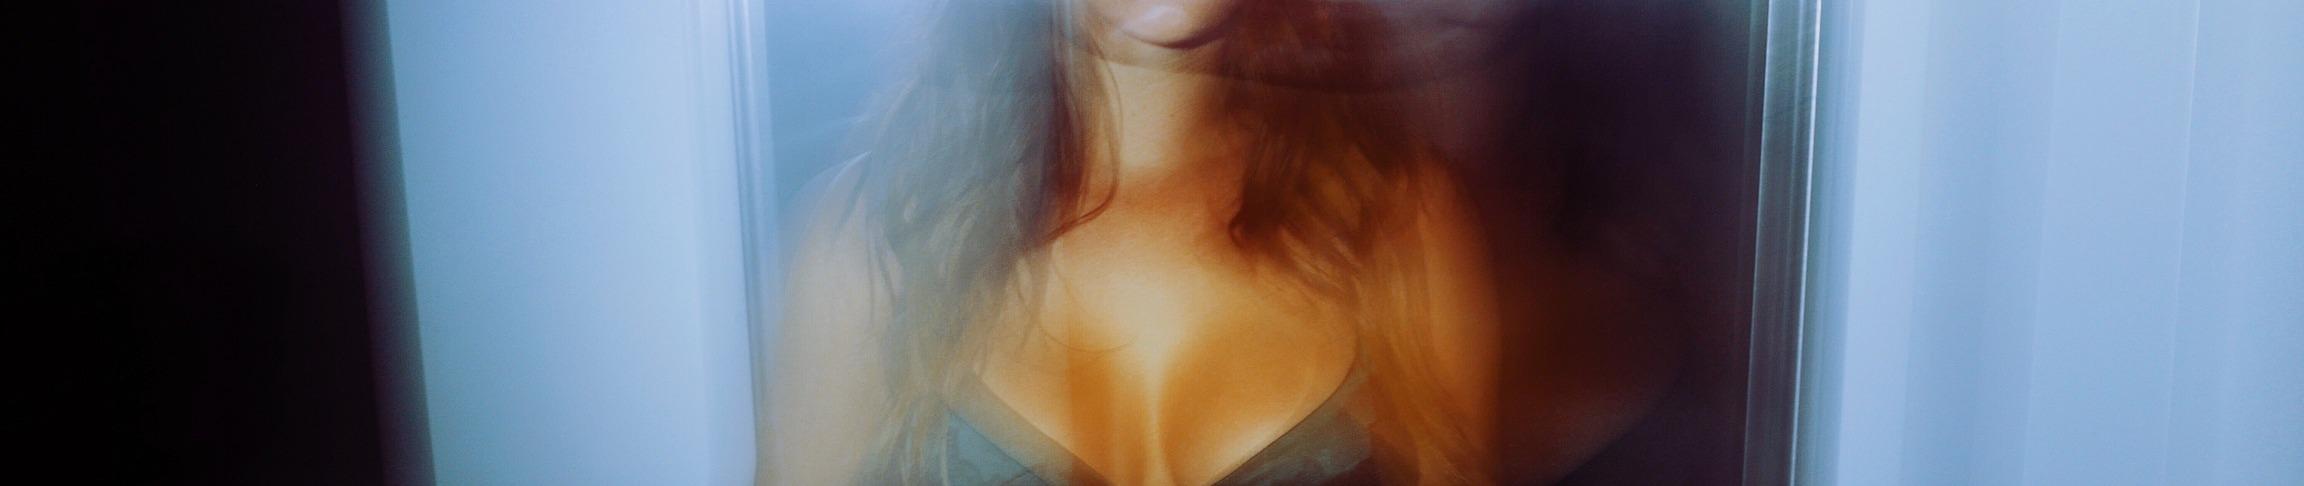 Eva Lovia - profile image